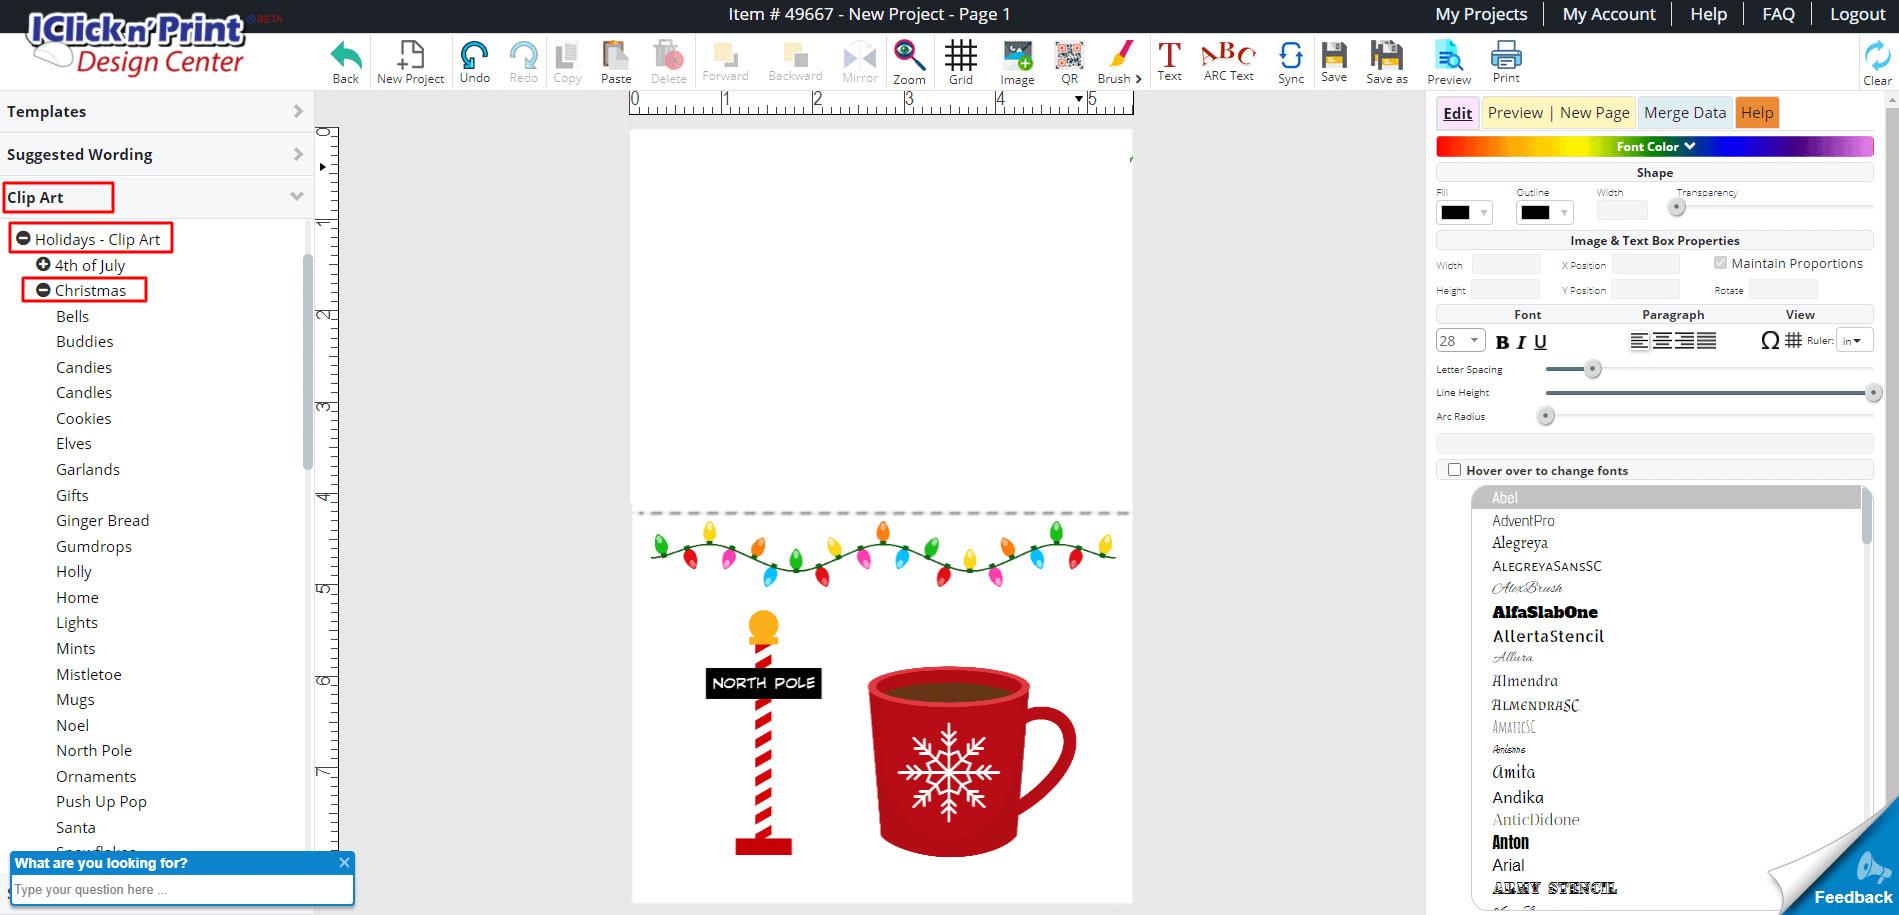 iclicknprint-Christmas-clipart-